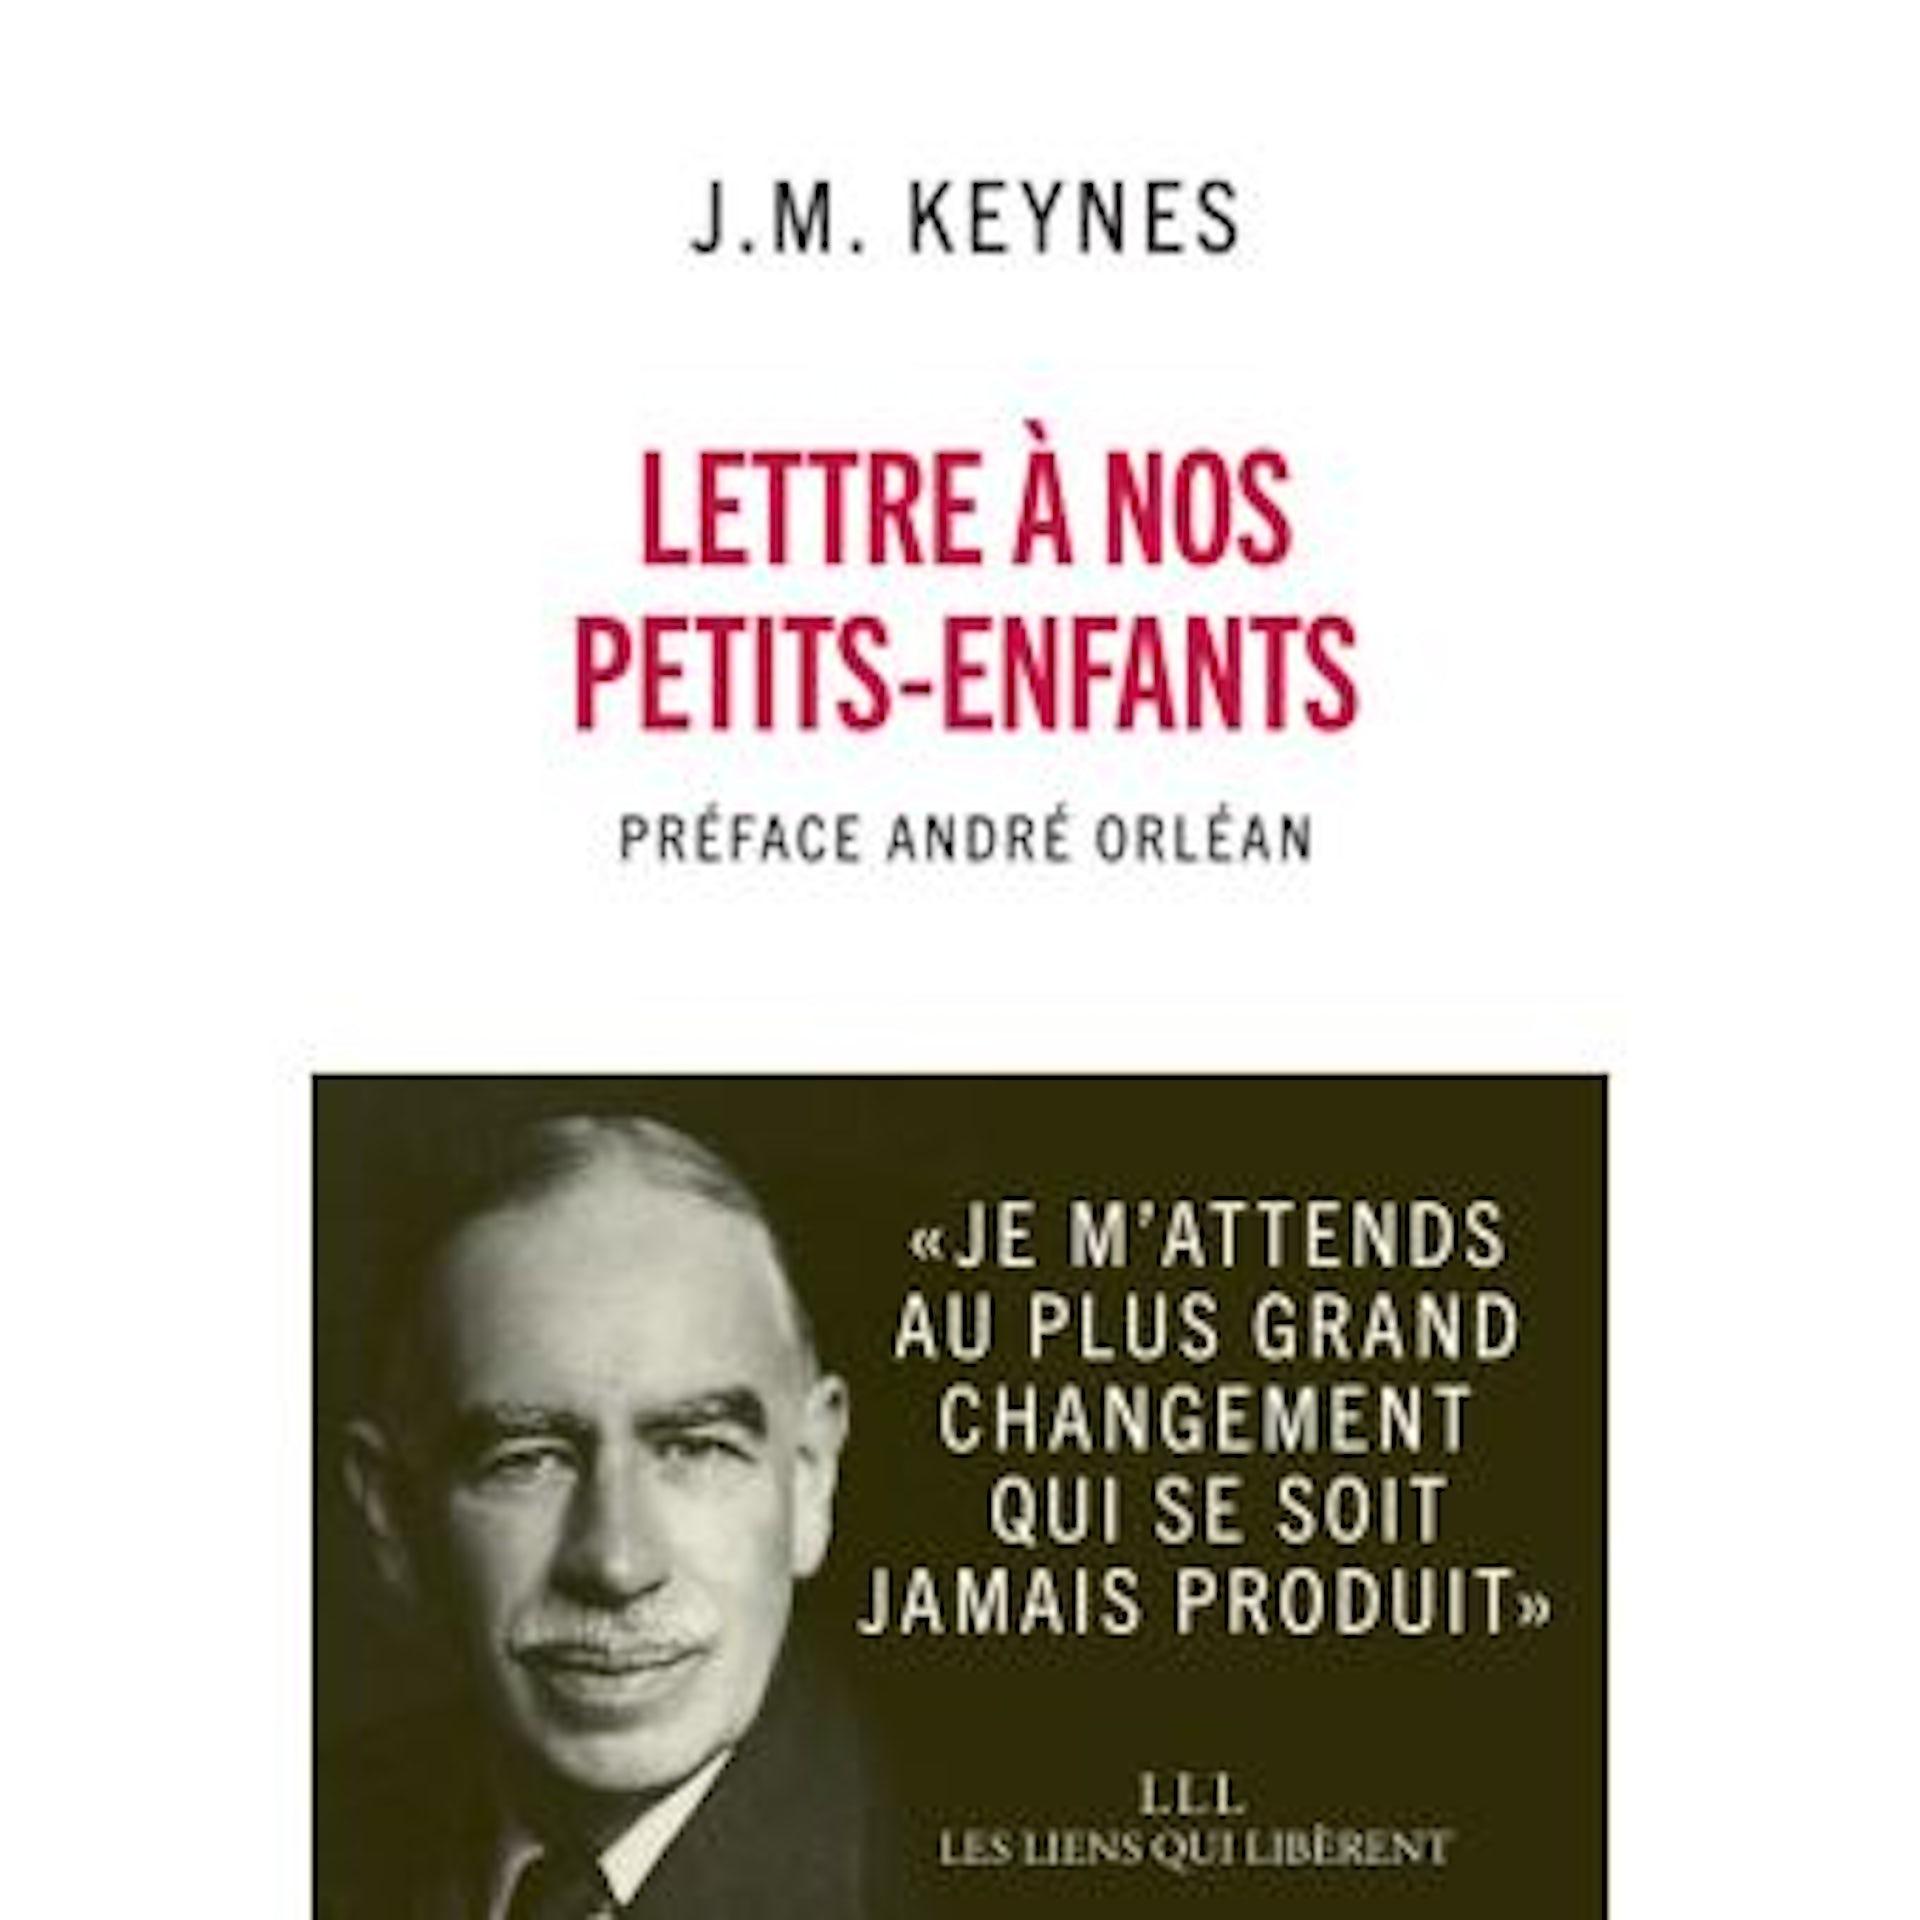 Lettre à nos petits-enfants, John Maynard Keynes (1930). Les Liens Qui Liberent